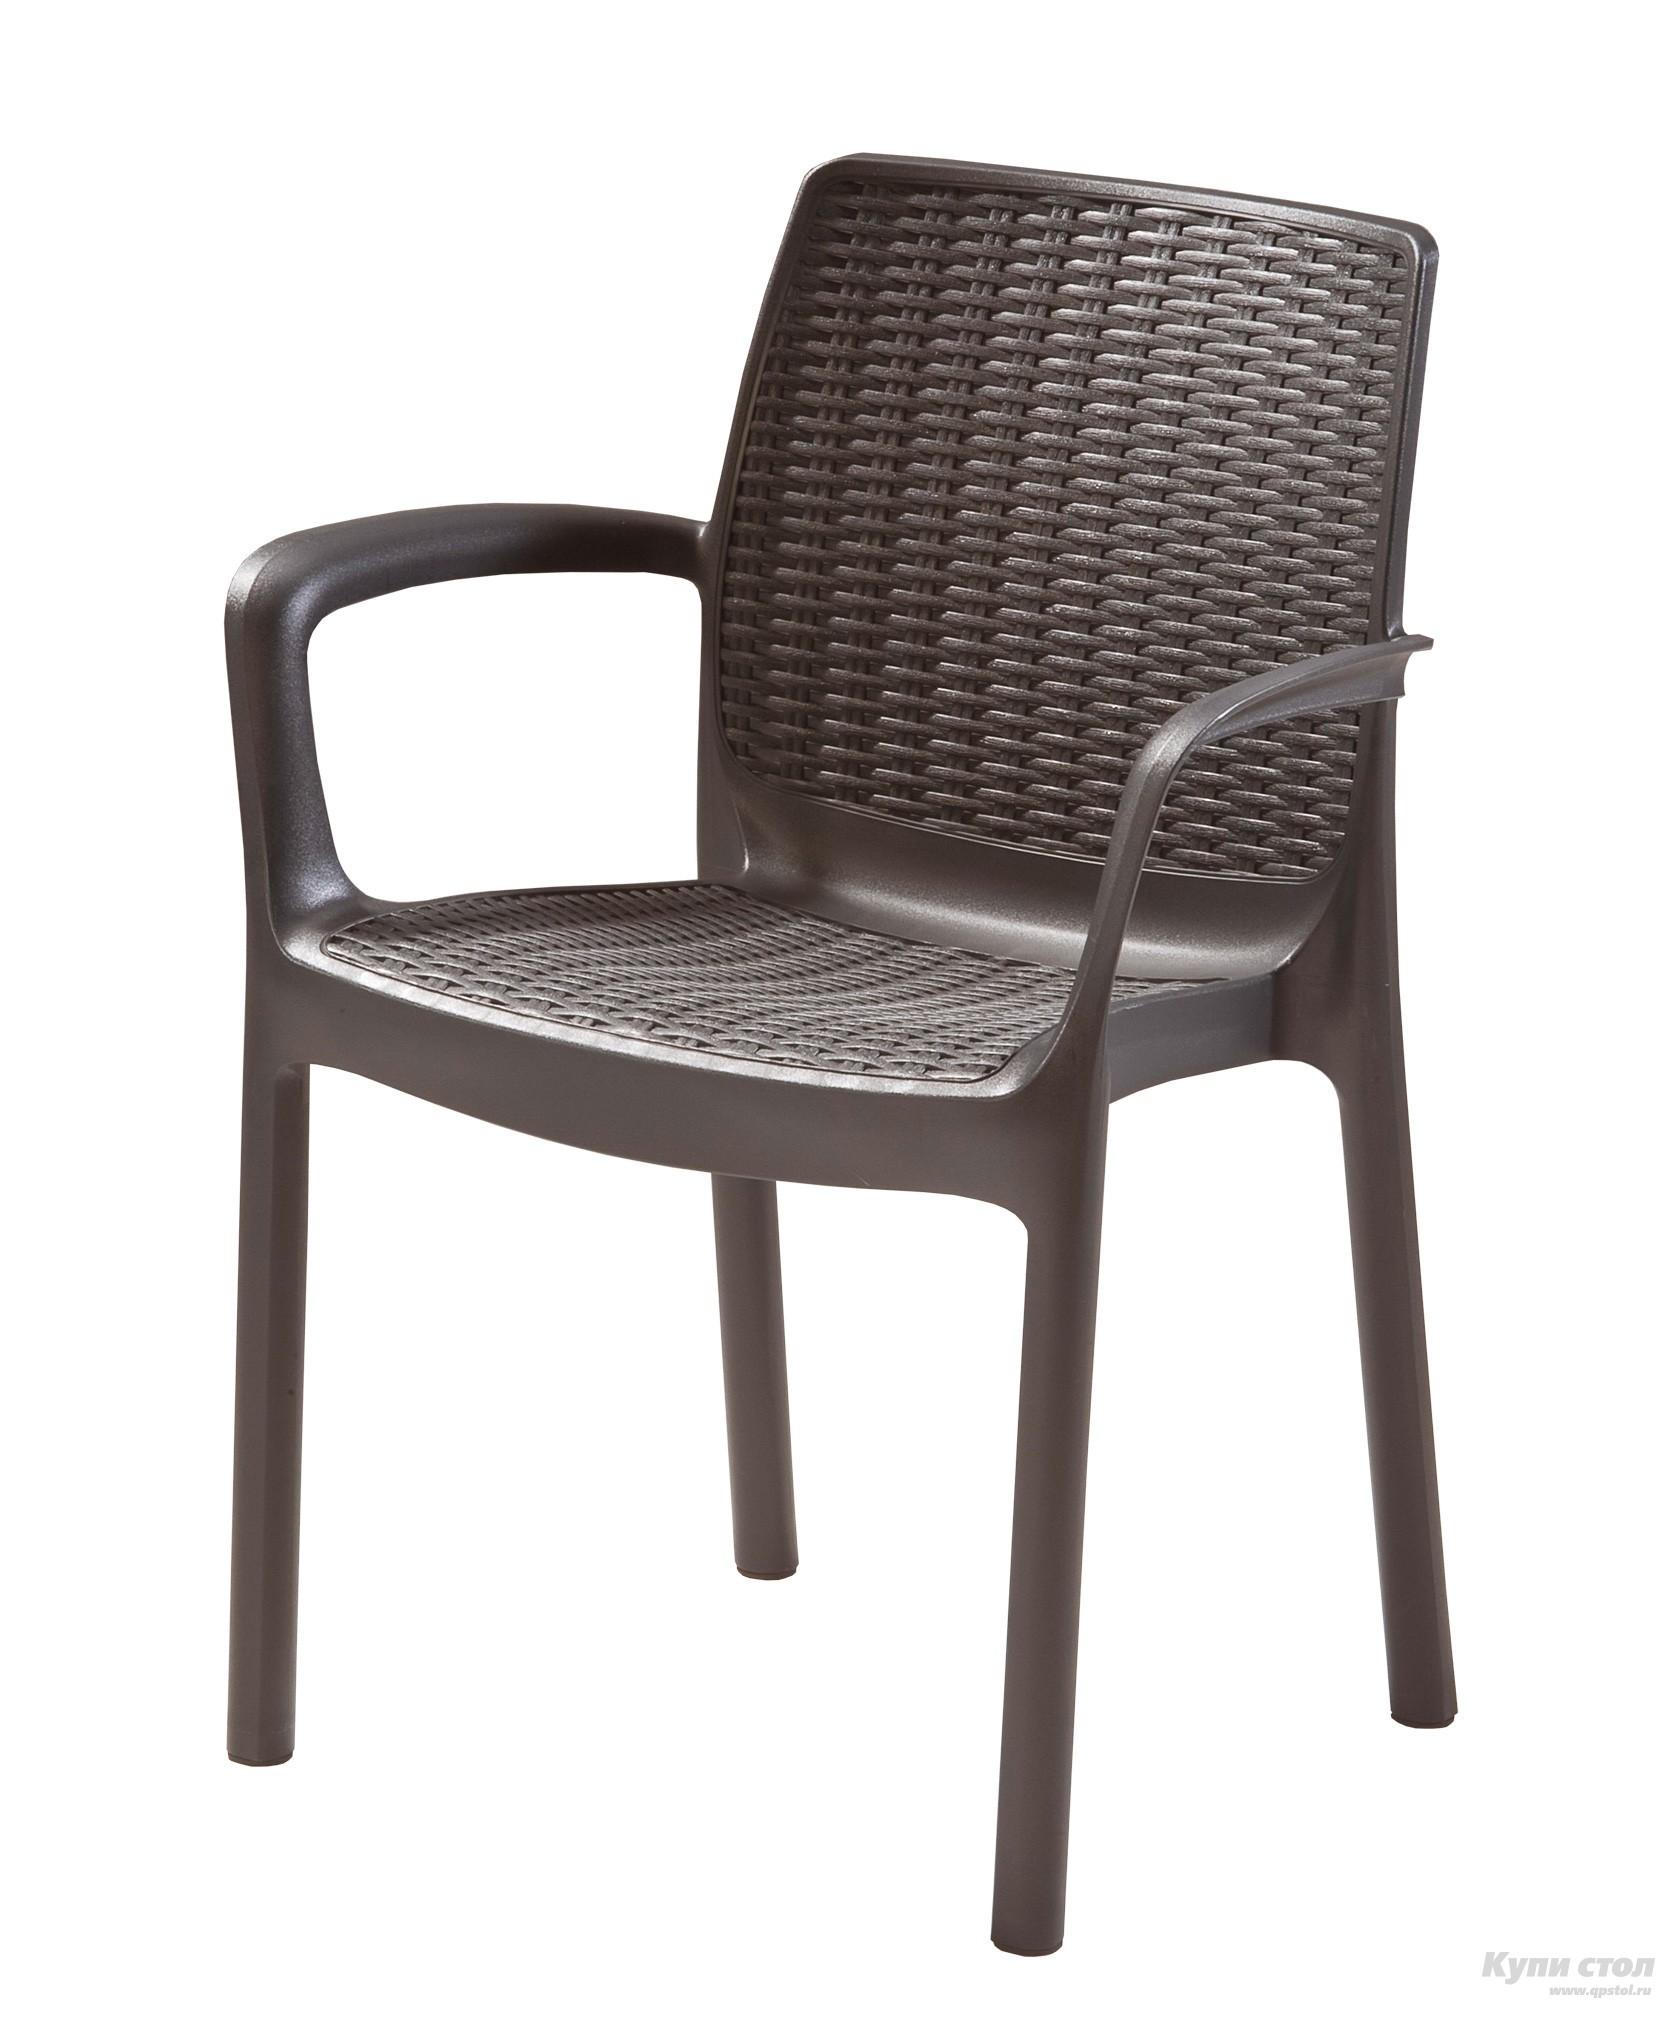 Плетеное кресло Стул BALI MONO (BALI 3) (из атмосферостойкого пластика, имитация ротанга) КупиСтол.Ru 4900.000